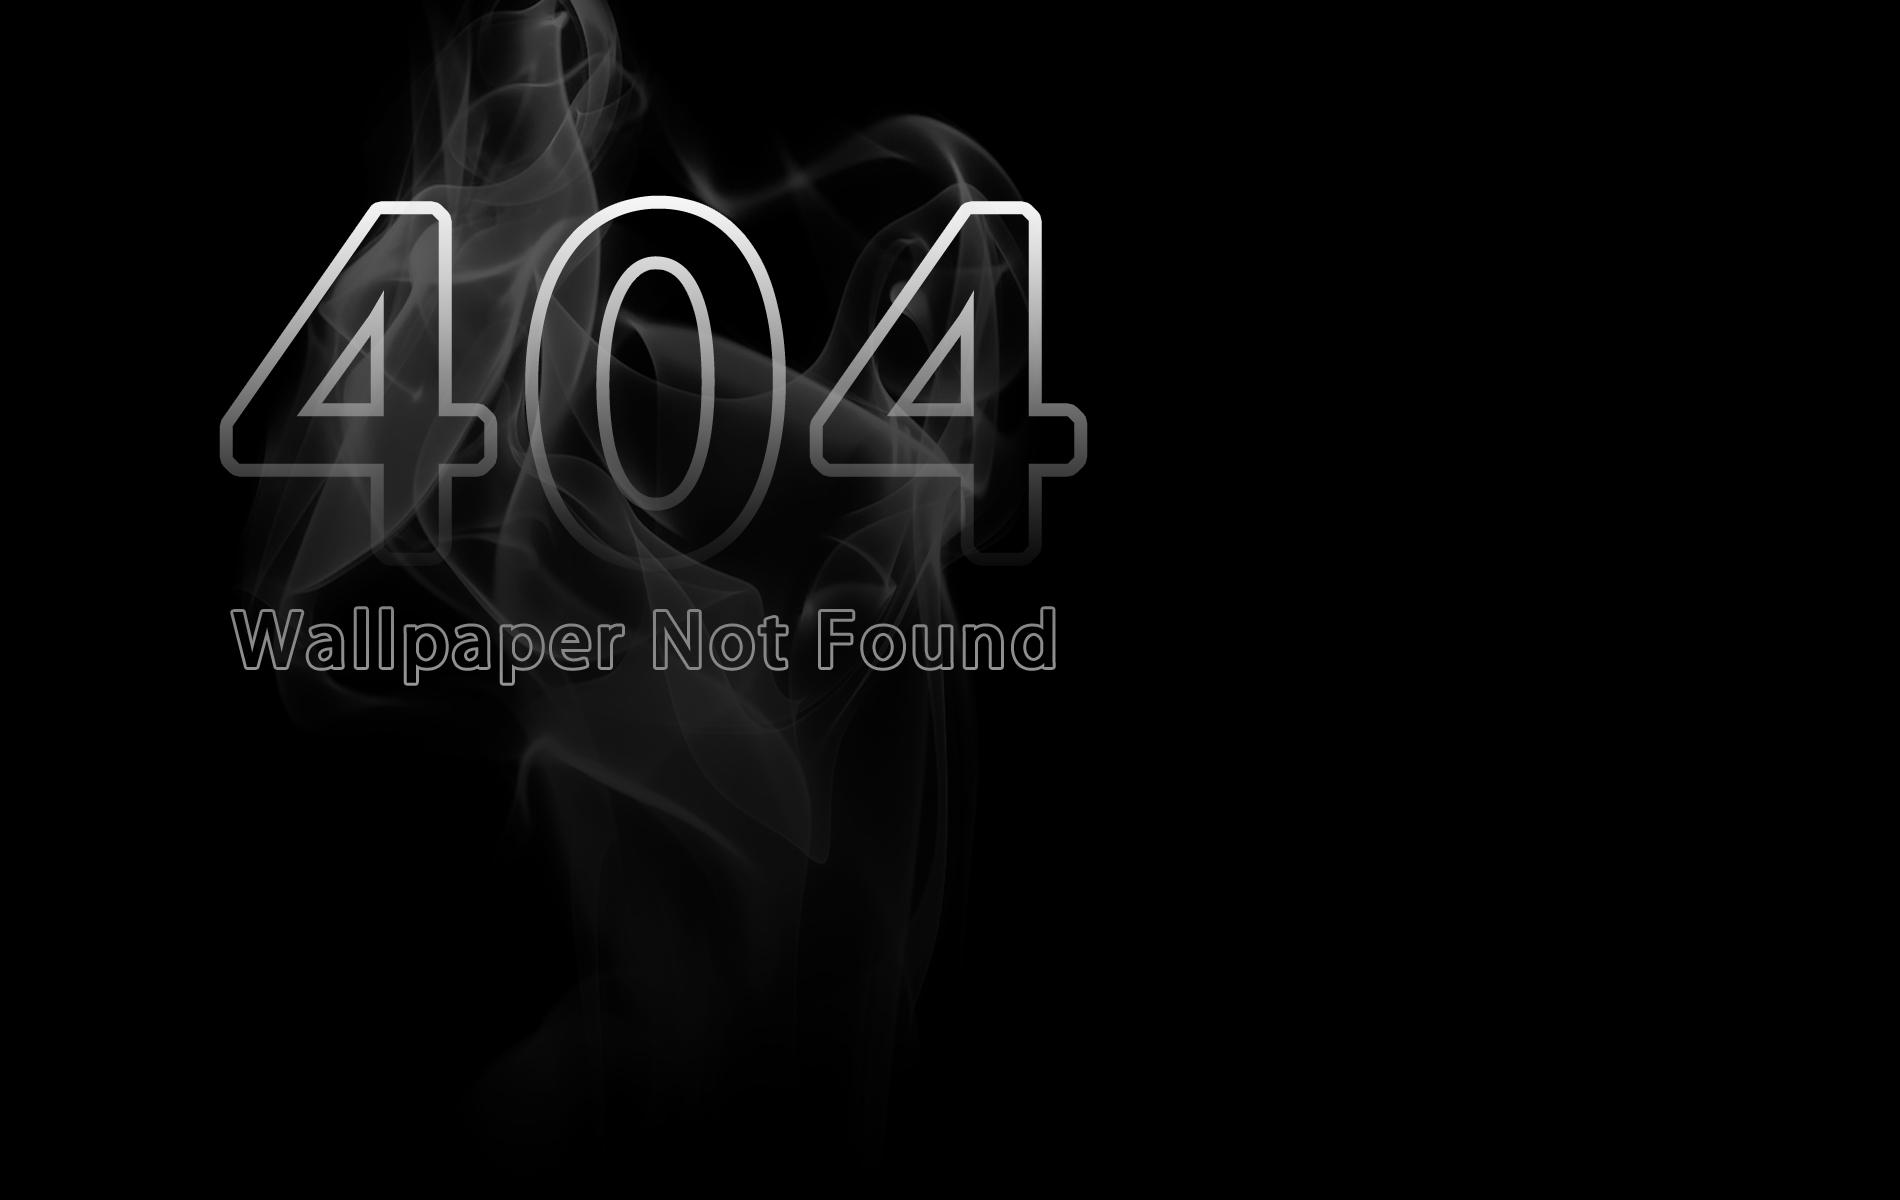 404 Wallpaper Not Found By Mopteek On Deviantart